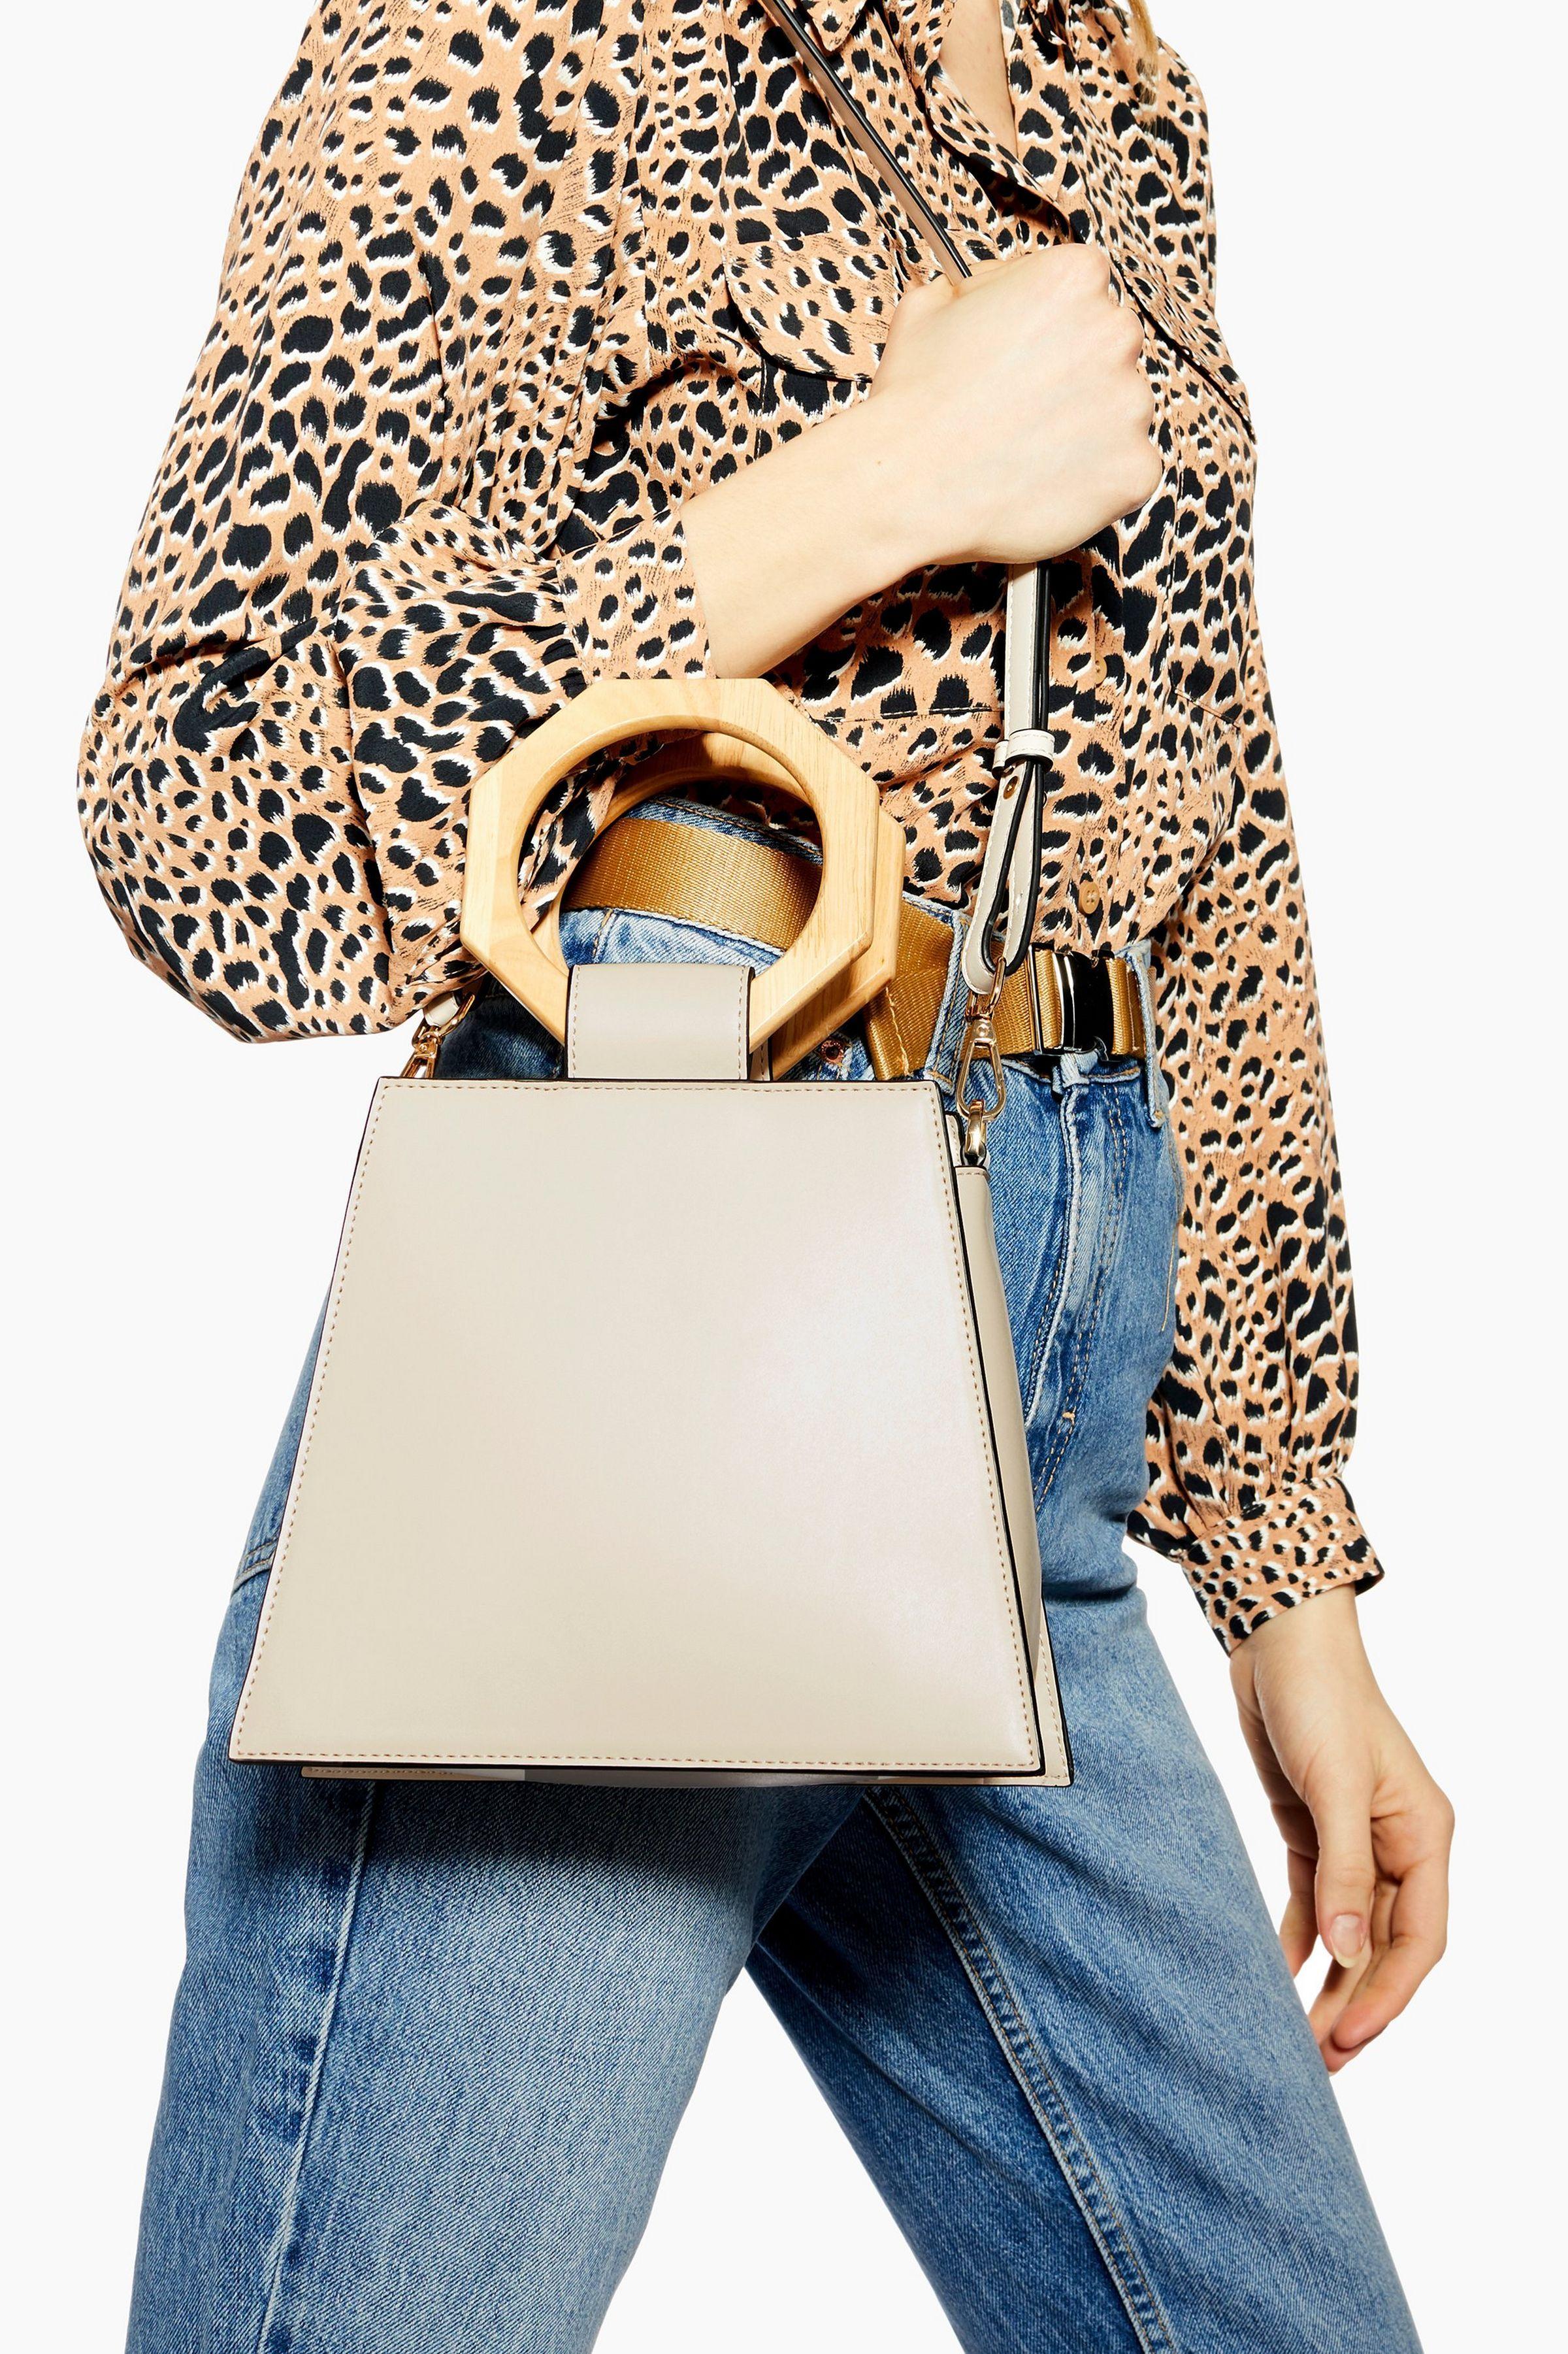 NEW Stunning Ladies Designer Inspired PU Leather Handbag Shoulder Tote Grab Bag